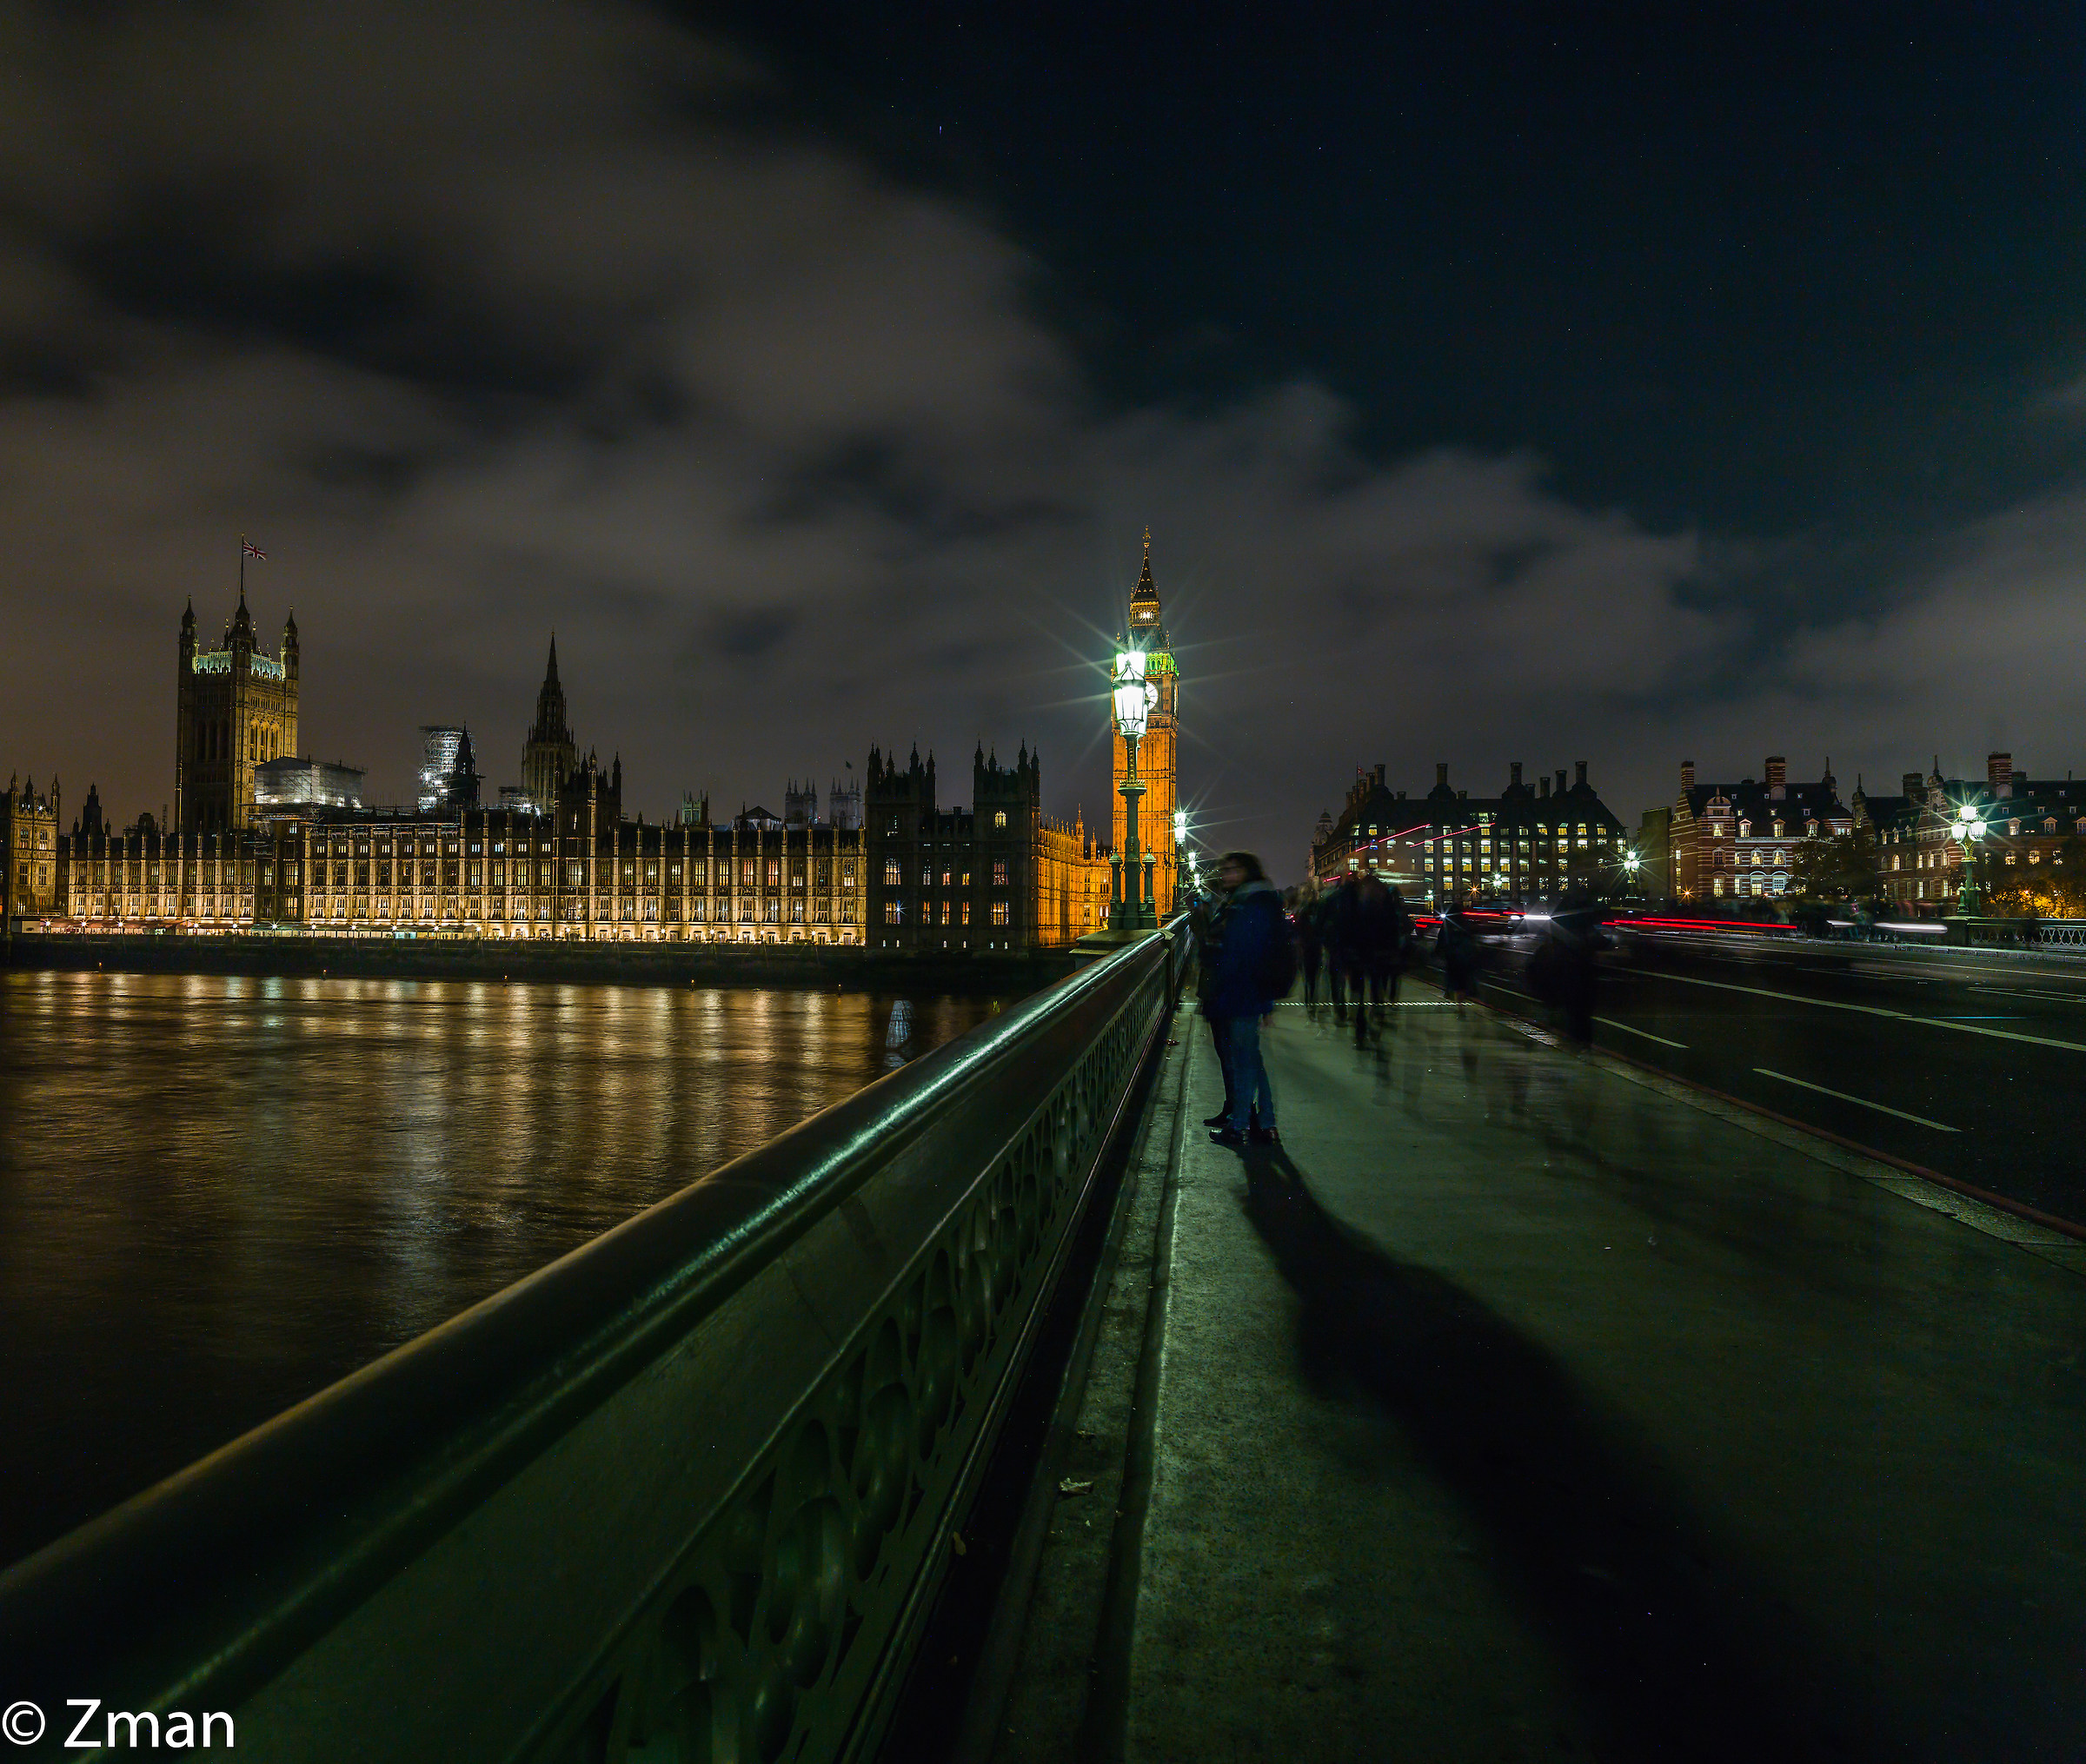 On London Bridge...